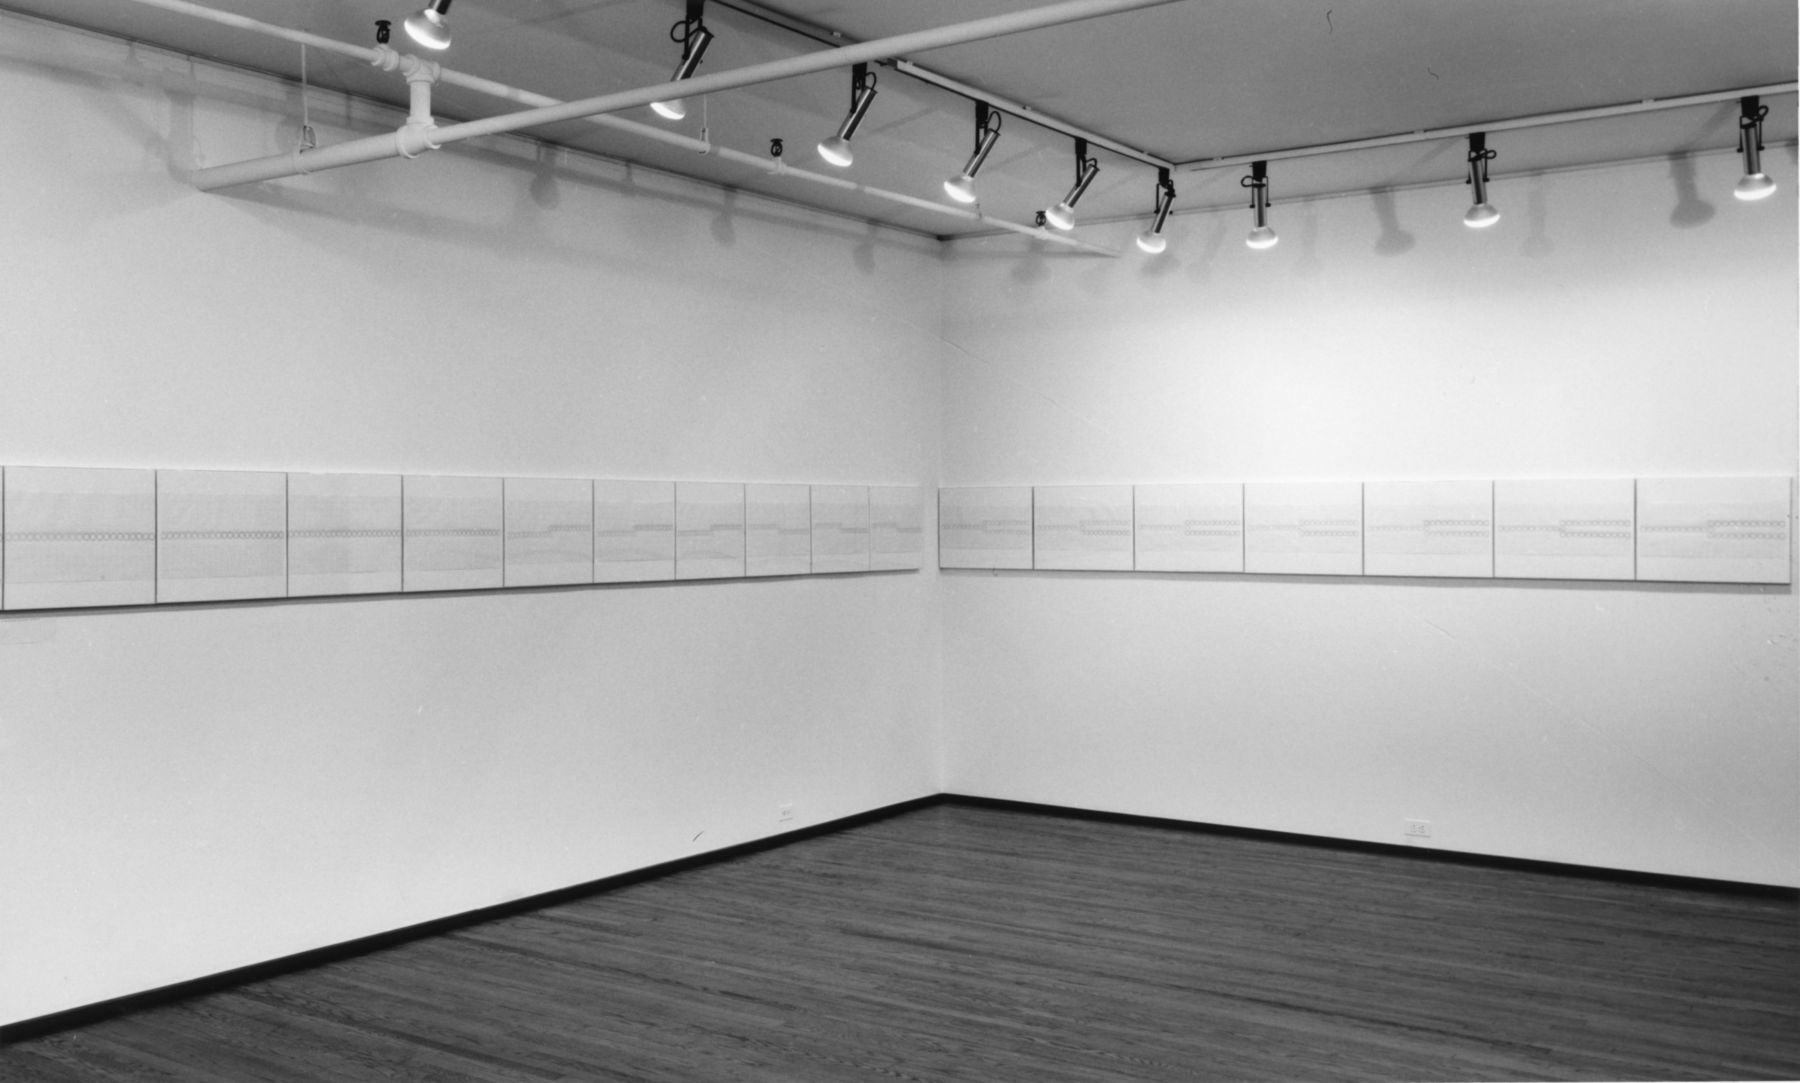 Installation view, Dan Flavin: Diagrams for Circular Flourescent Light, 420 WEST BROADWAY